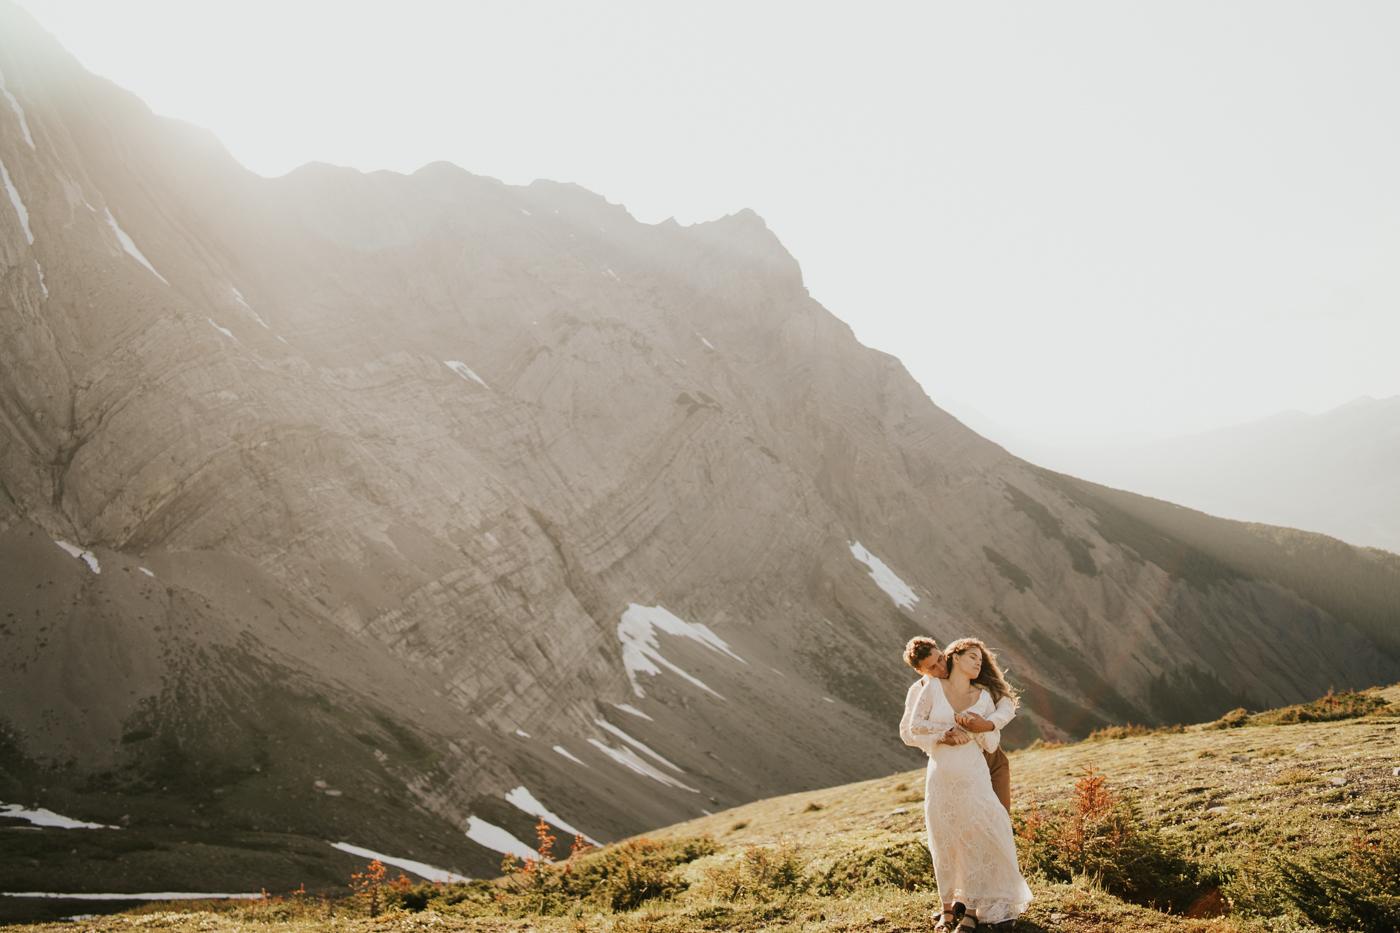 tyraephotography_photographer_wedding_elopement_engagement_photography-08518.jpg